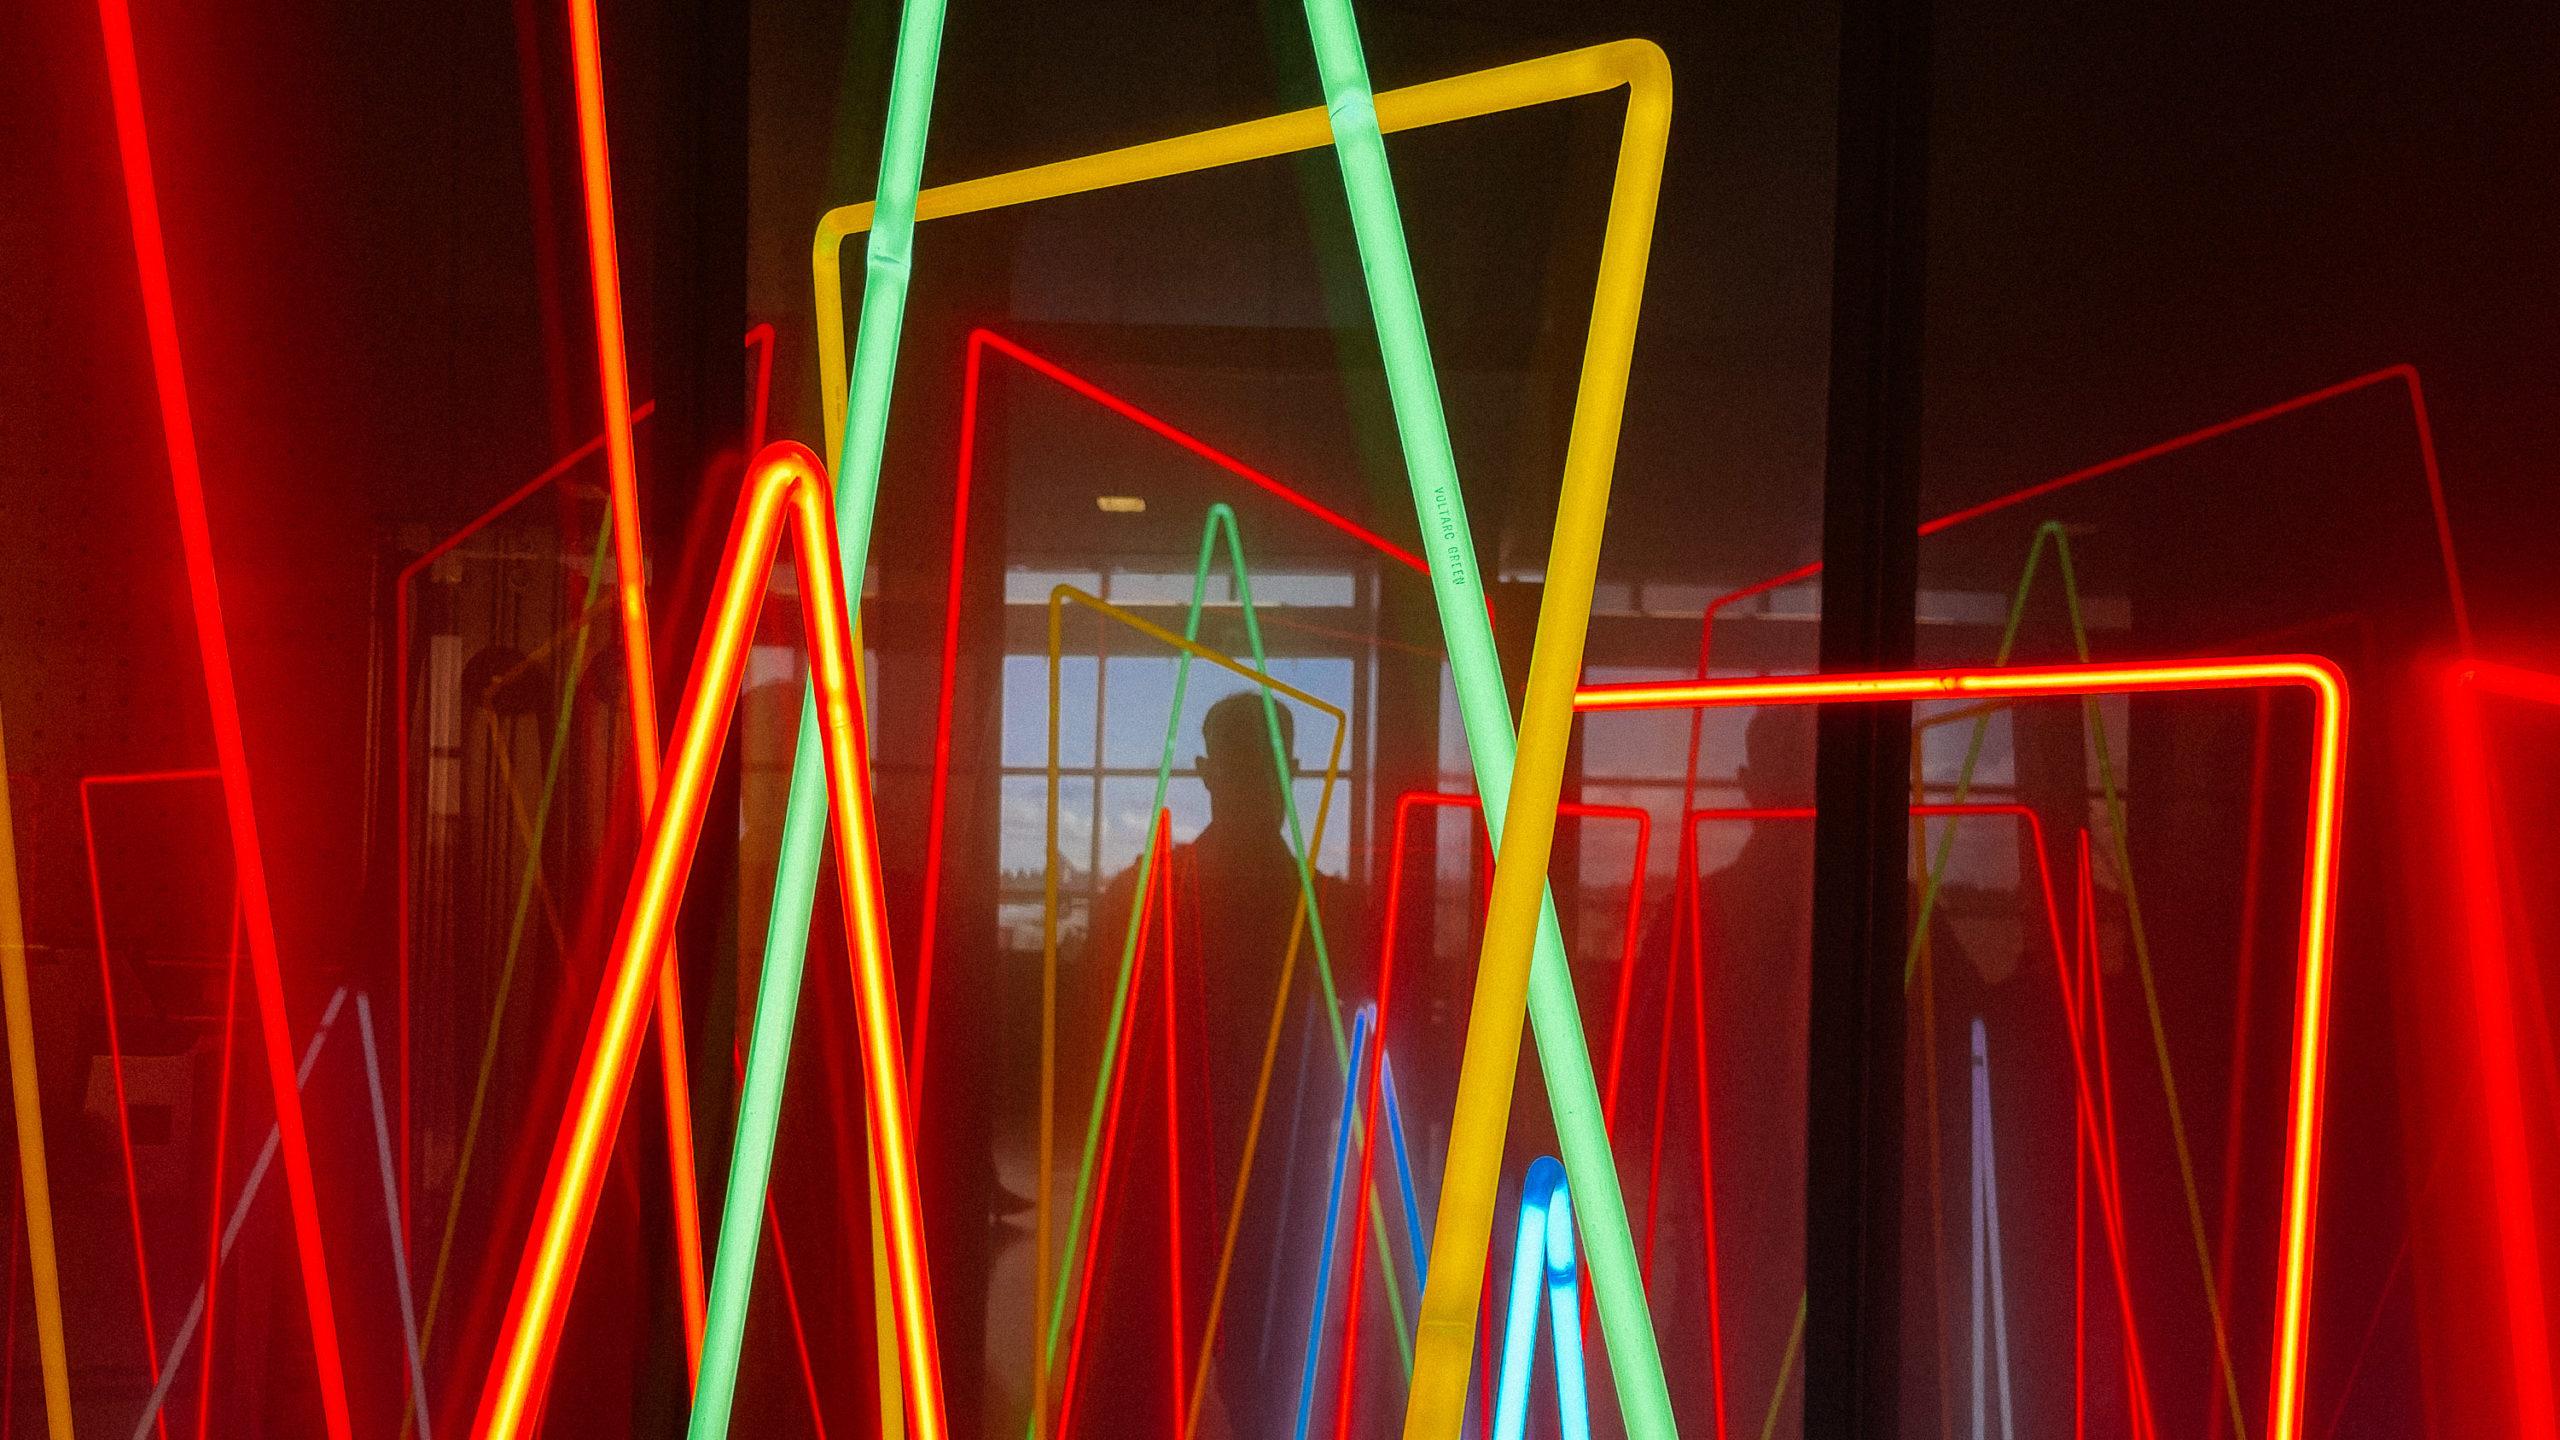 Colorful neon art